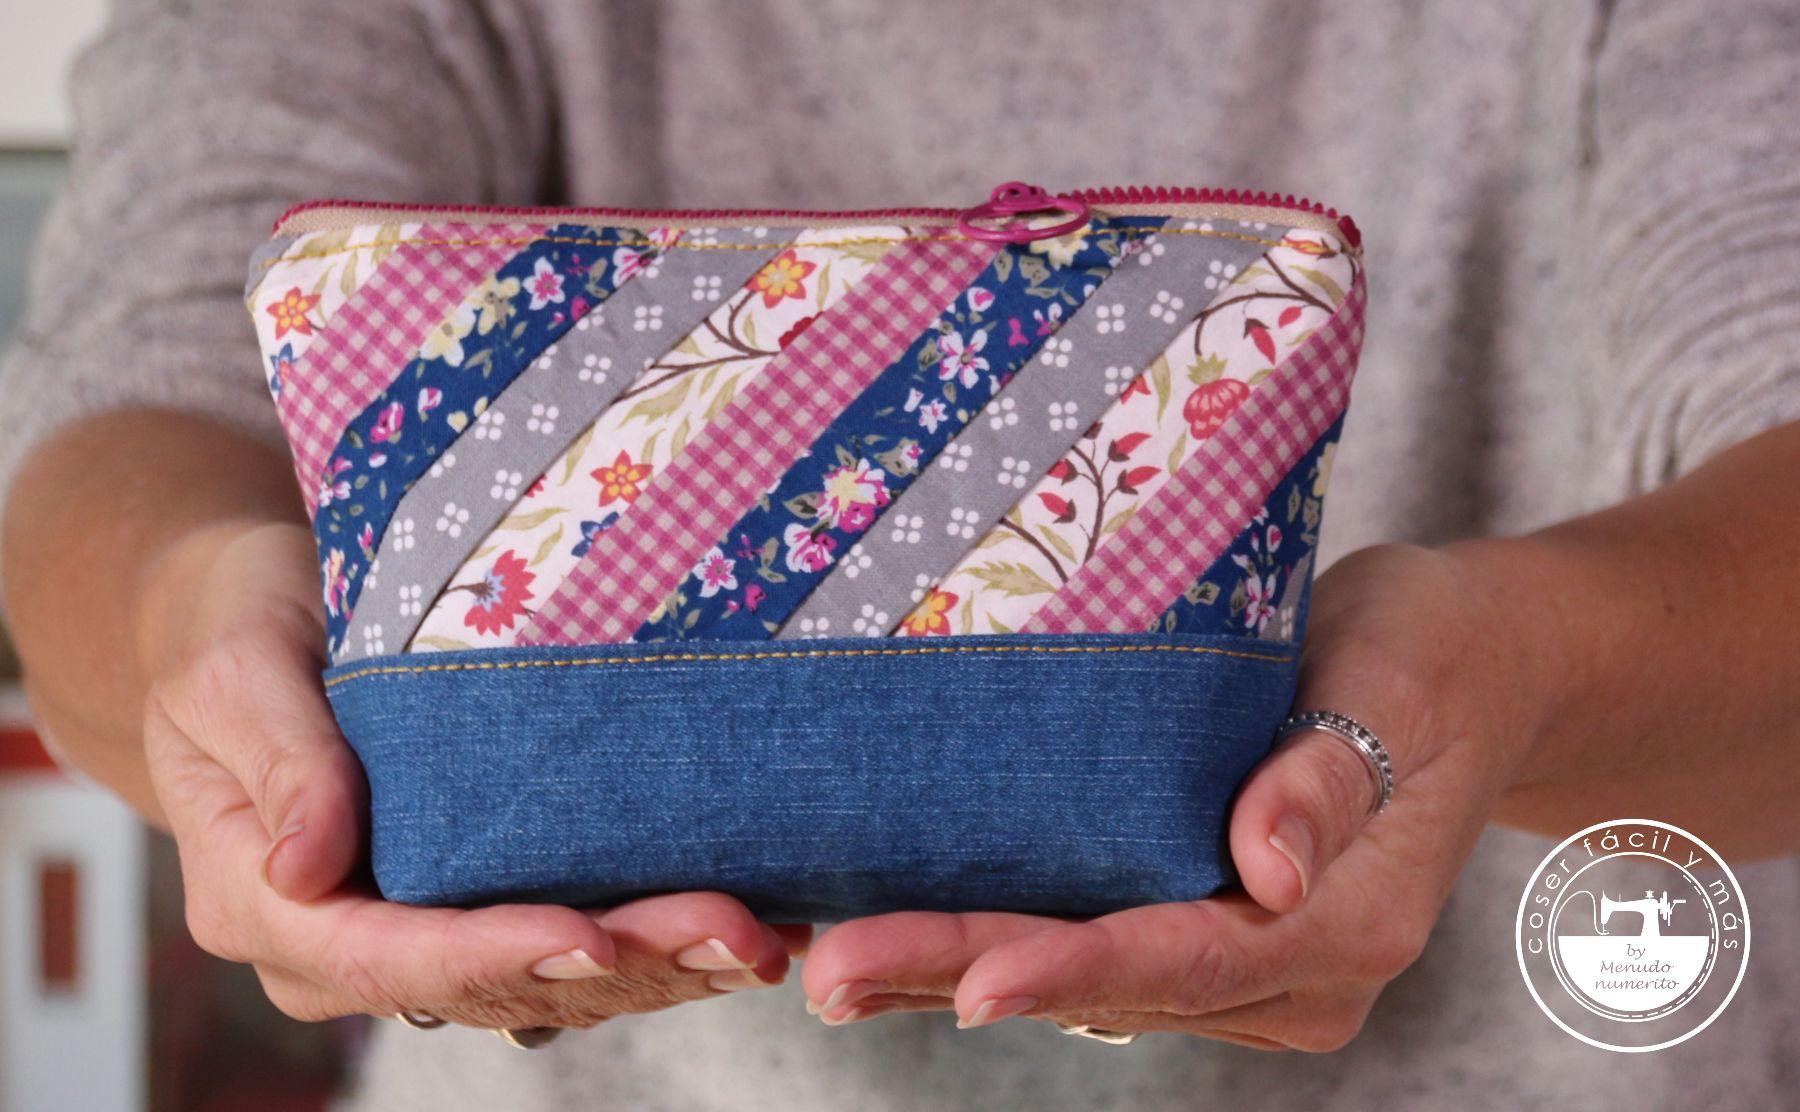 neceser patchwork plastificado coser facil menudo numerito blogs de costura